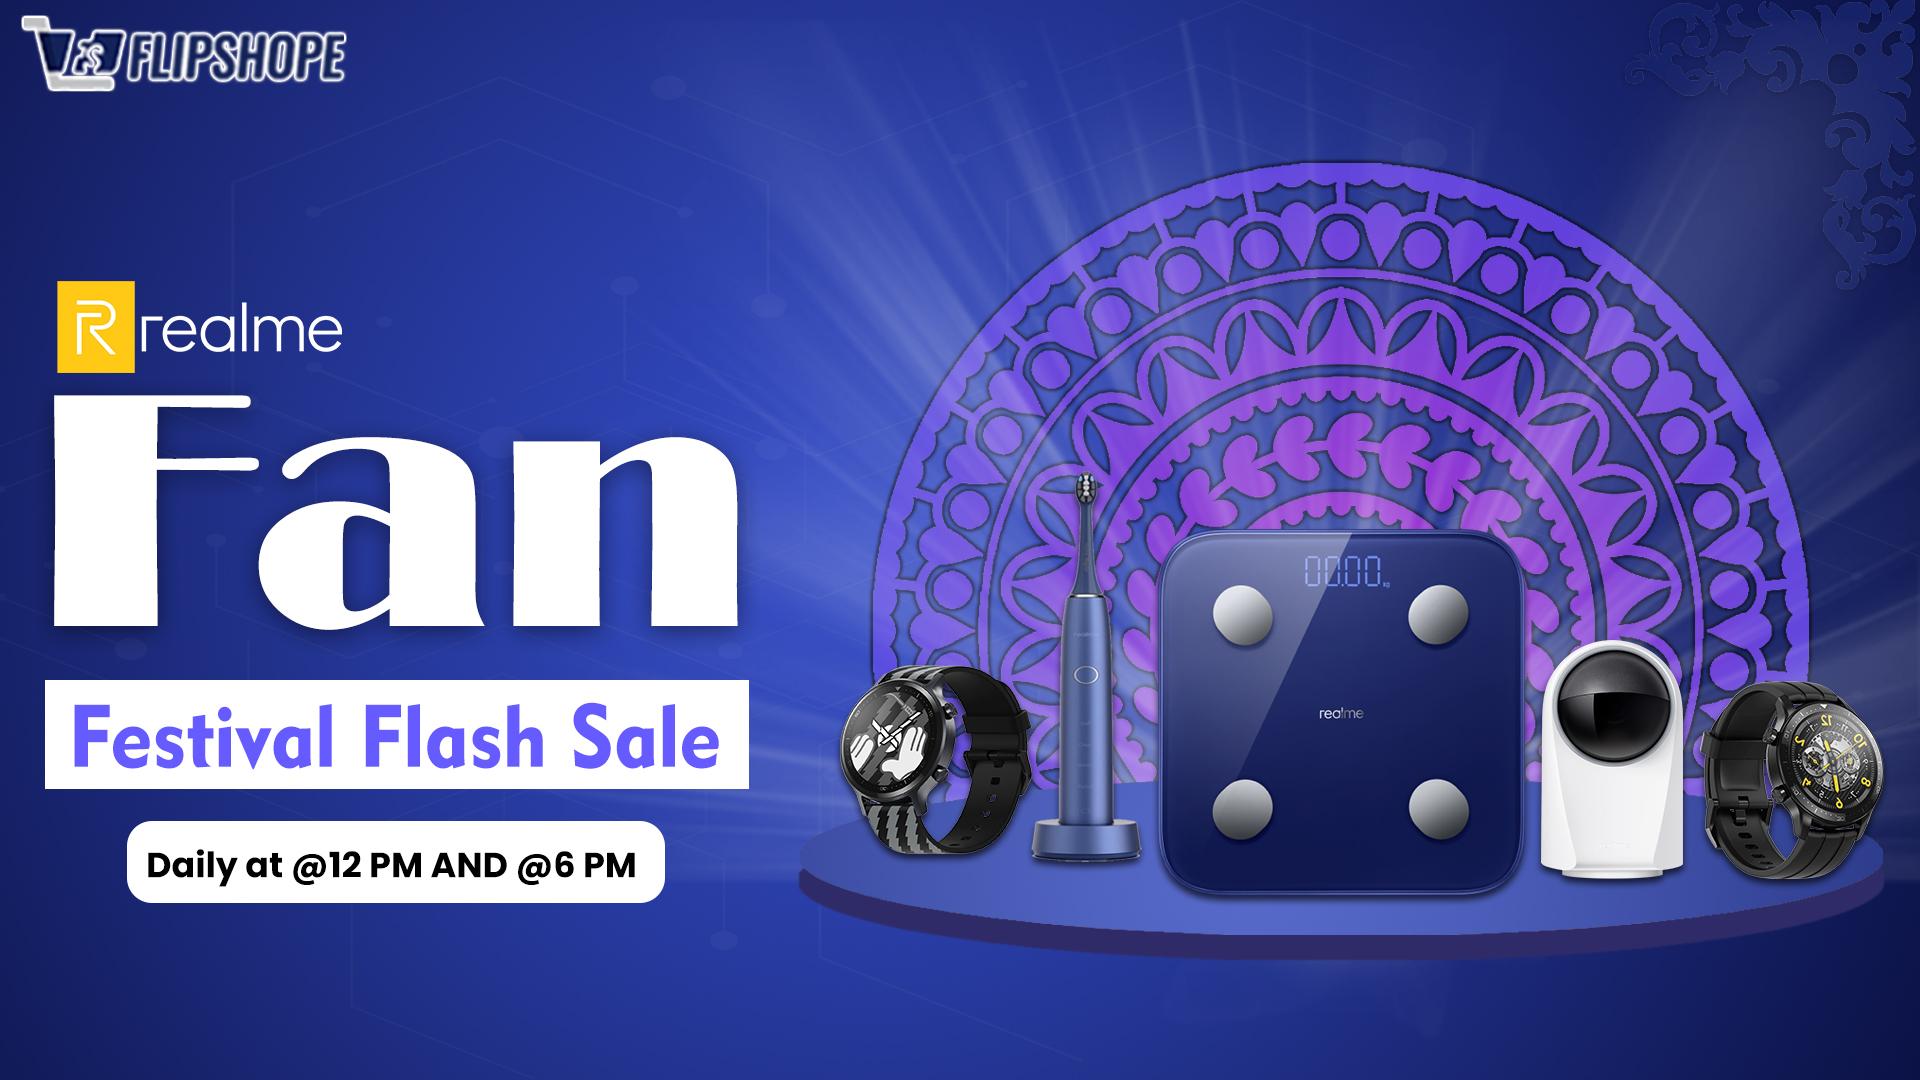 realme fan festival flash sale